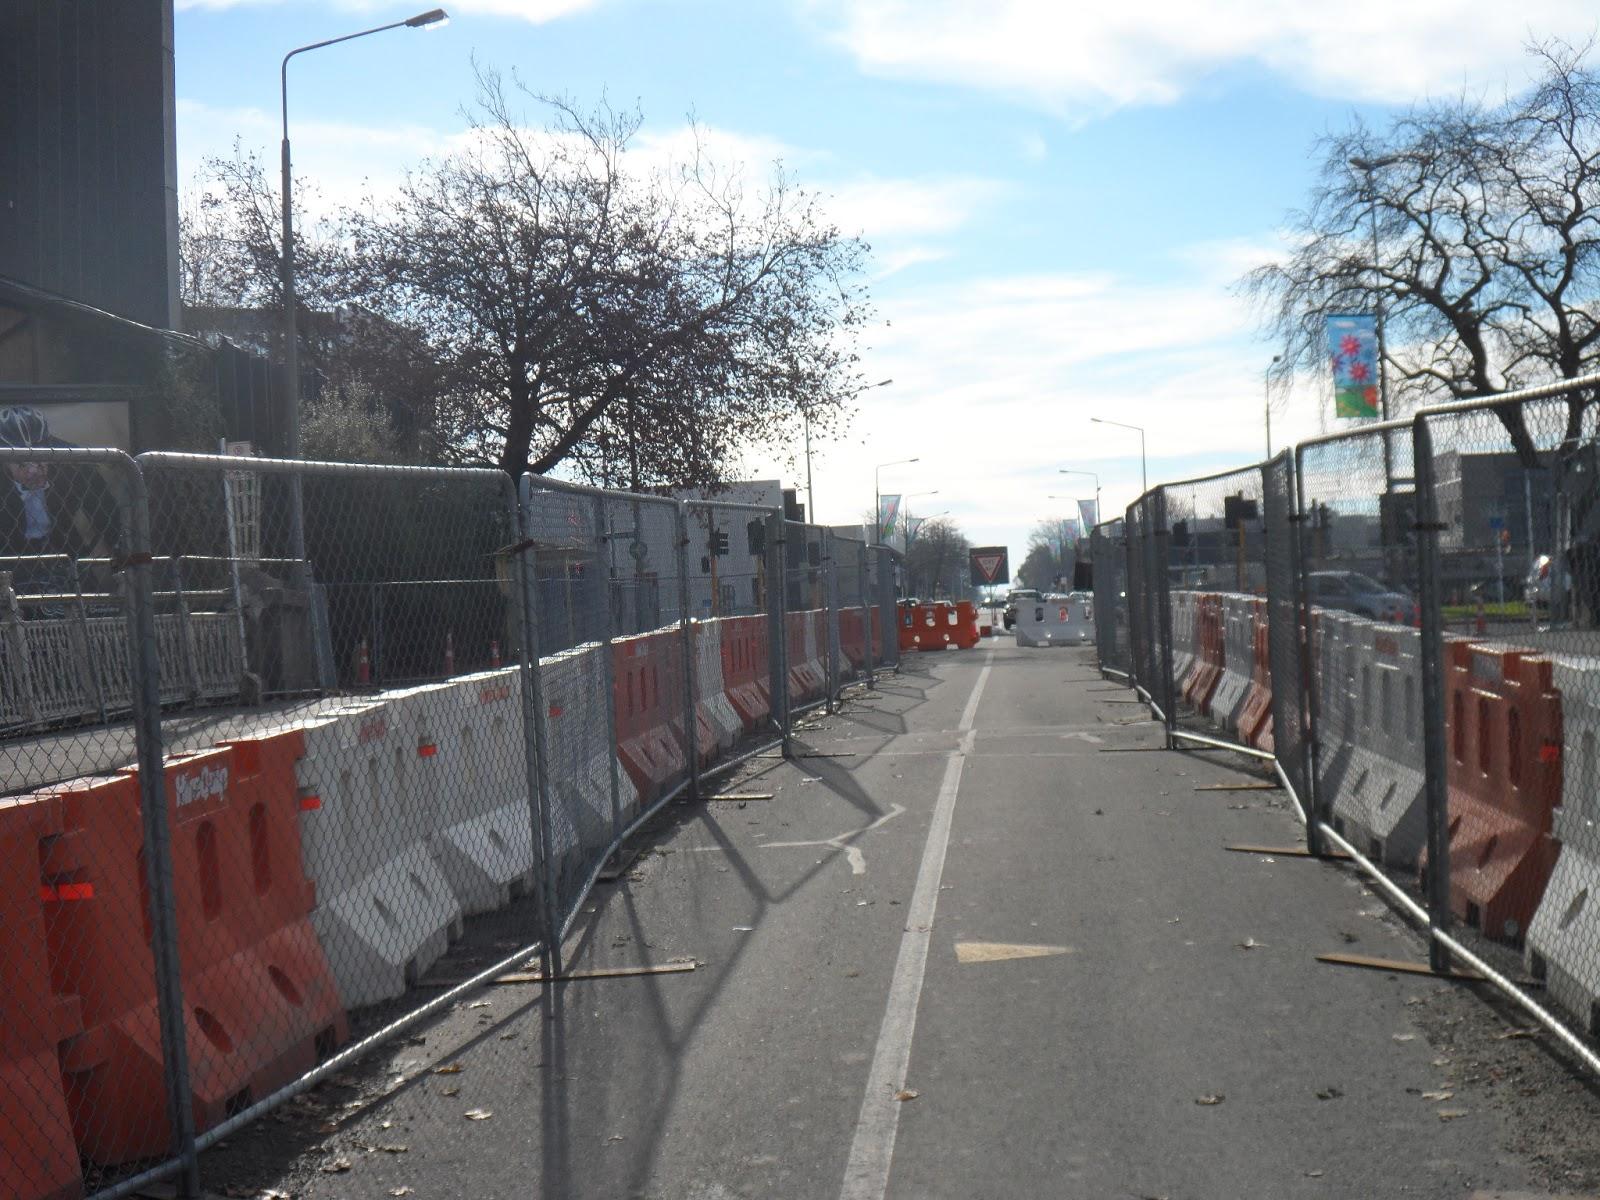 Woza Wanderer: NZDF Soldiers Gone, CERA Dictatorship ...